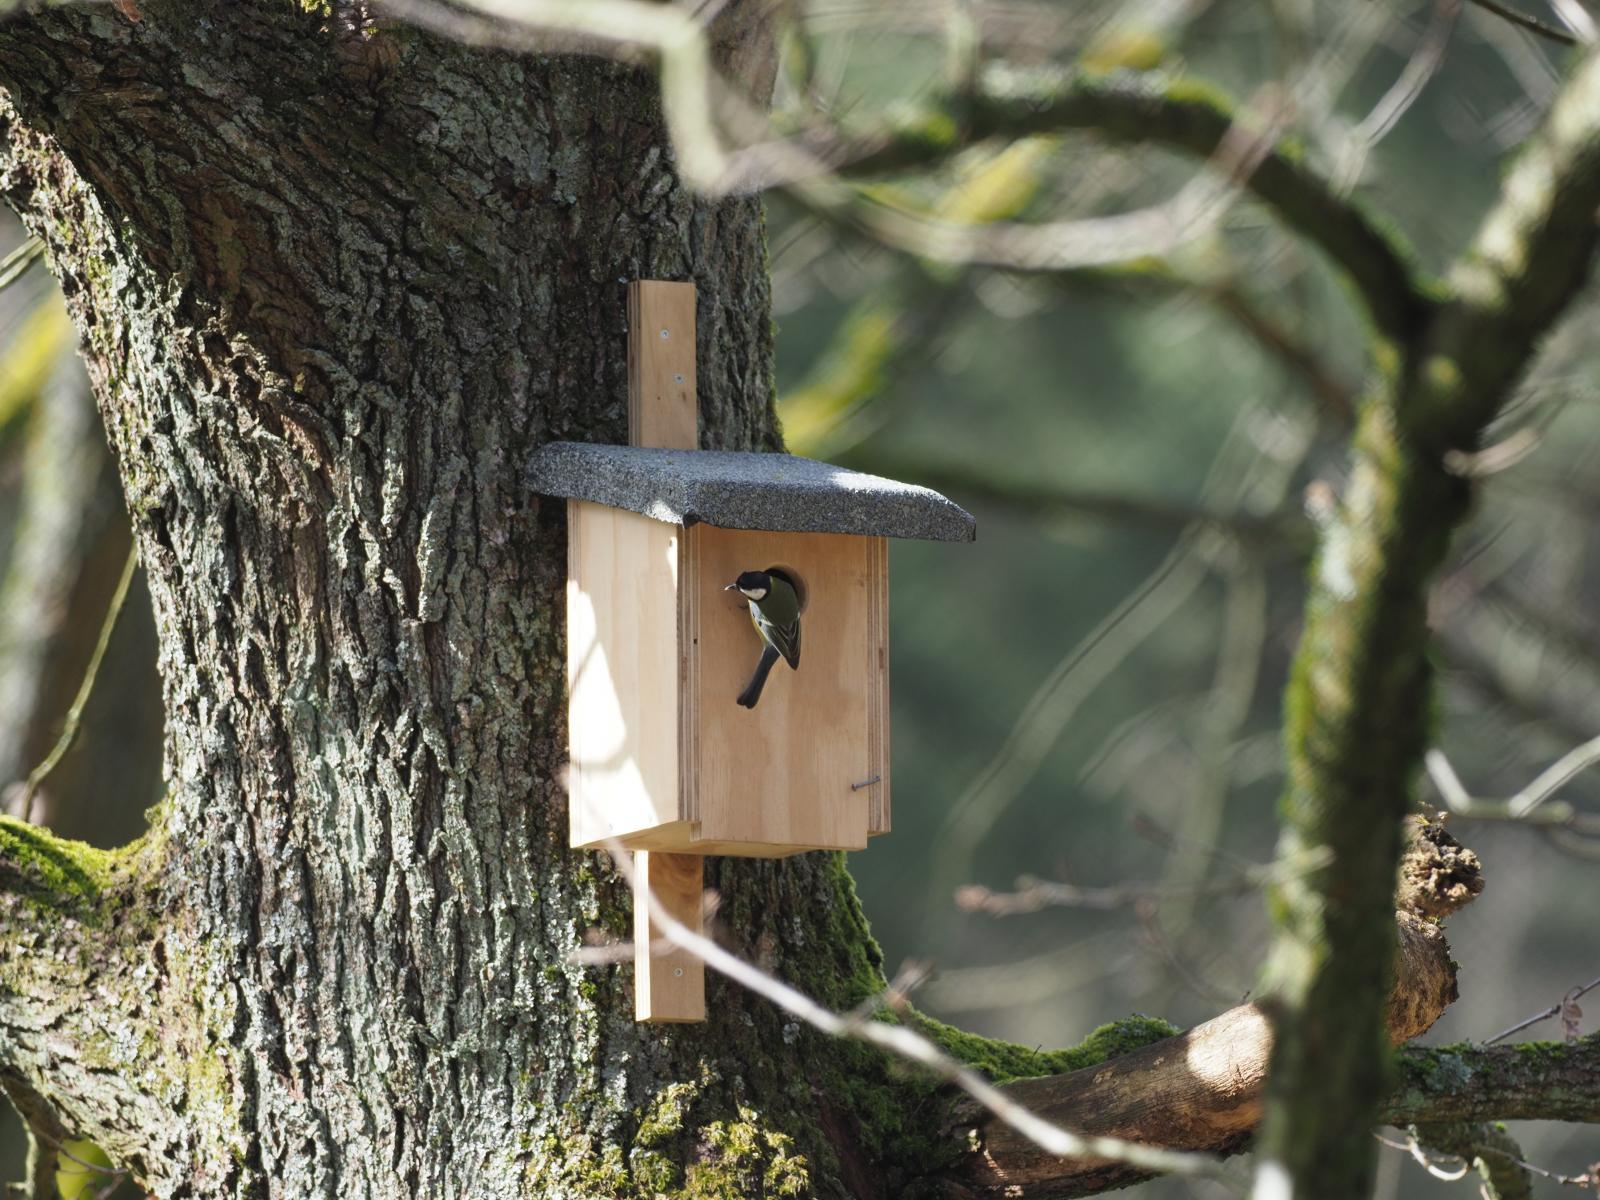 Nesting box for the birds